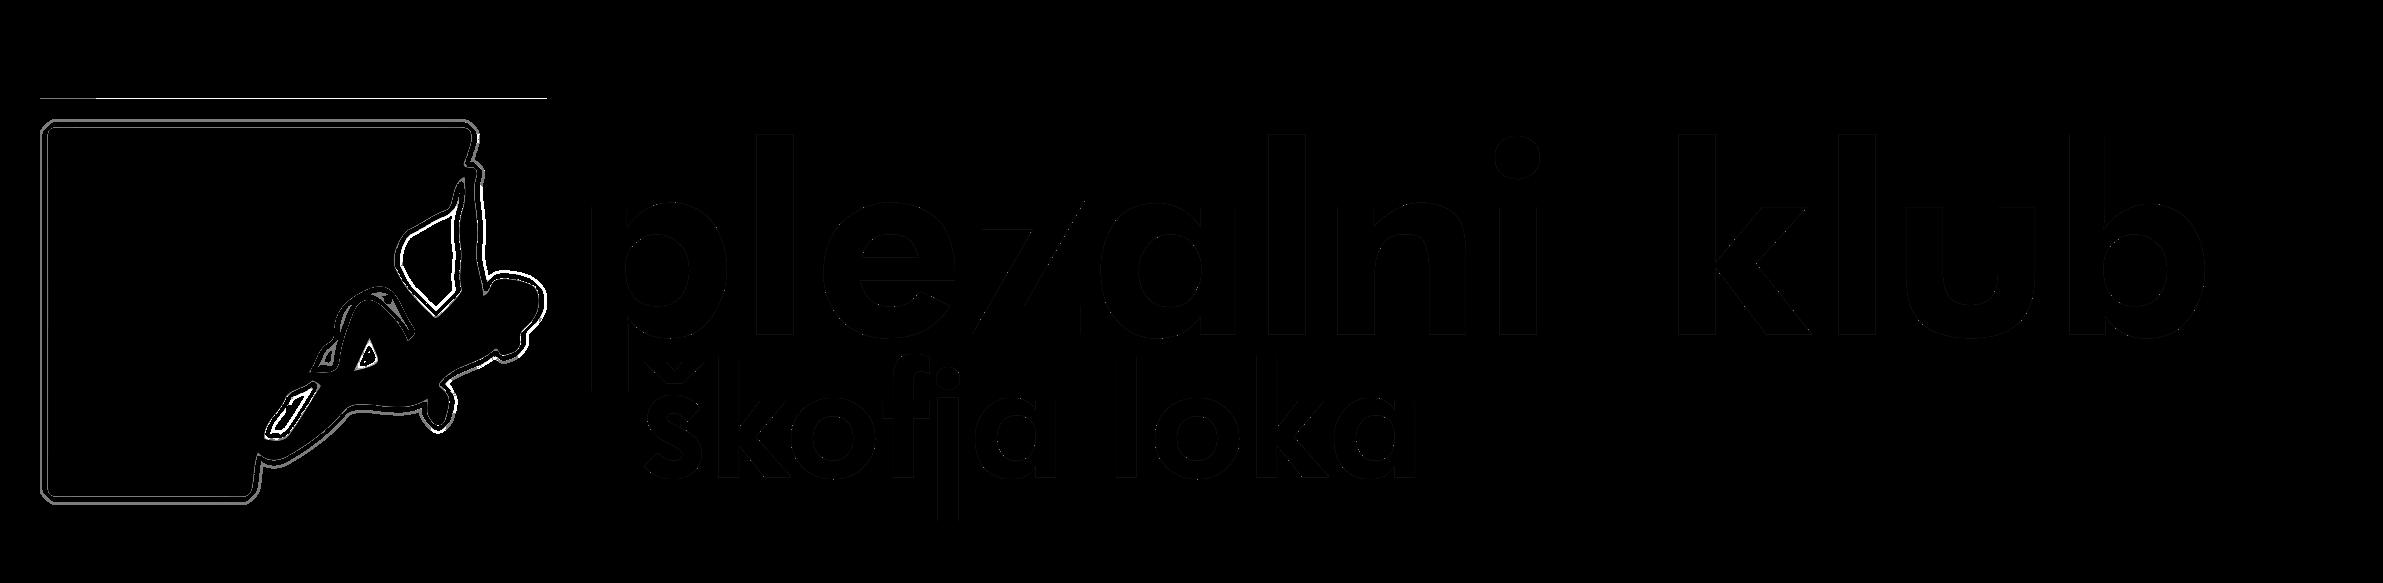 logo pk škofja loka